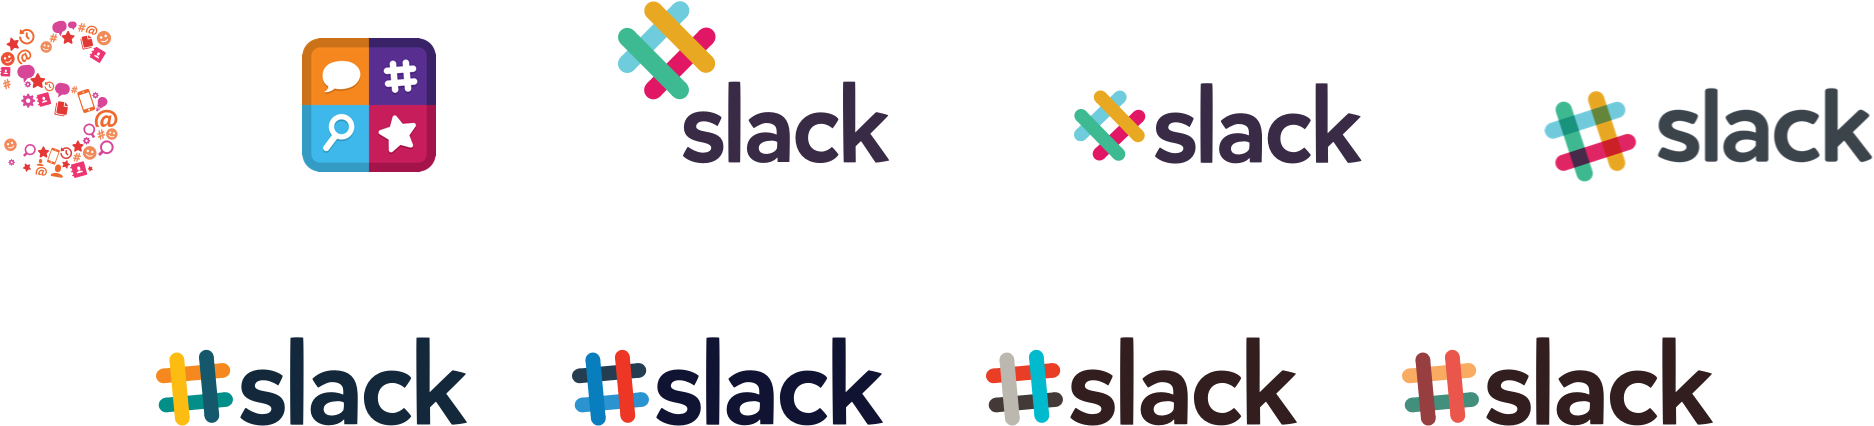 Slack logos